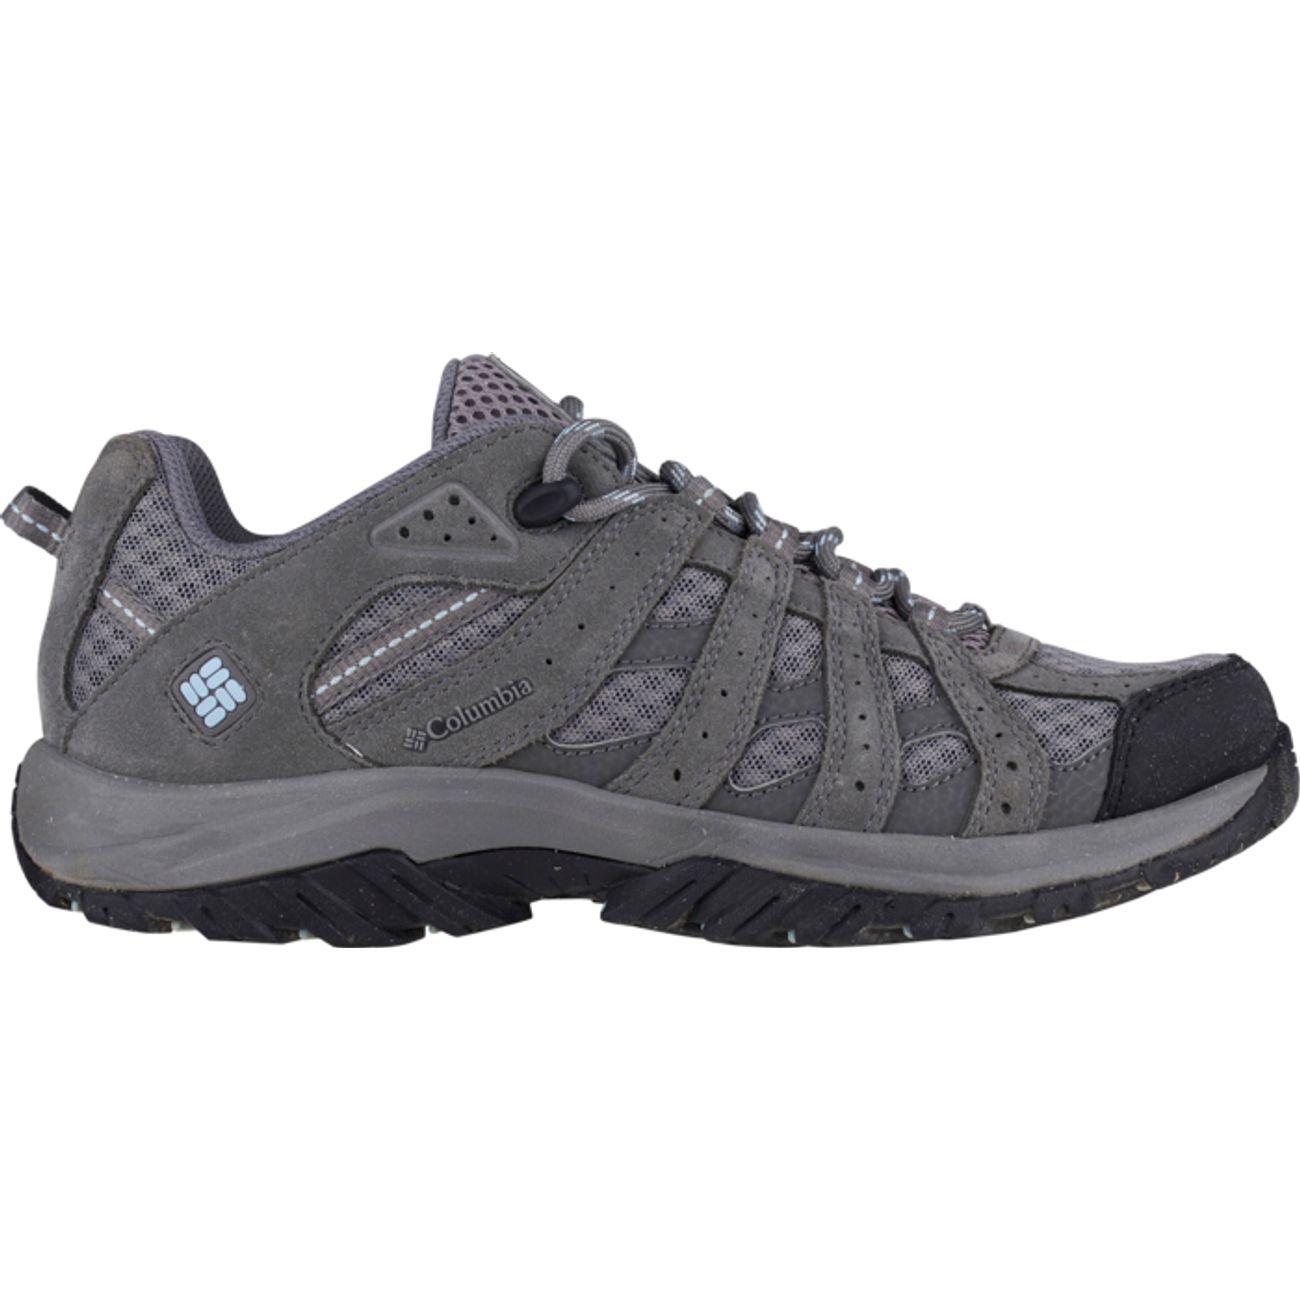 Chaussures Randonnée femme Columbia Canyon Point